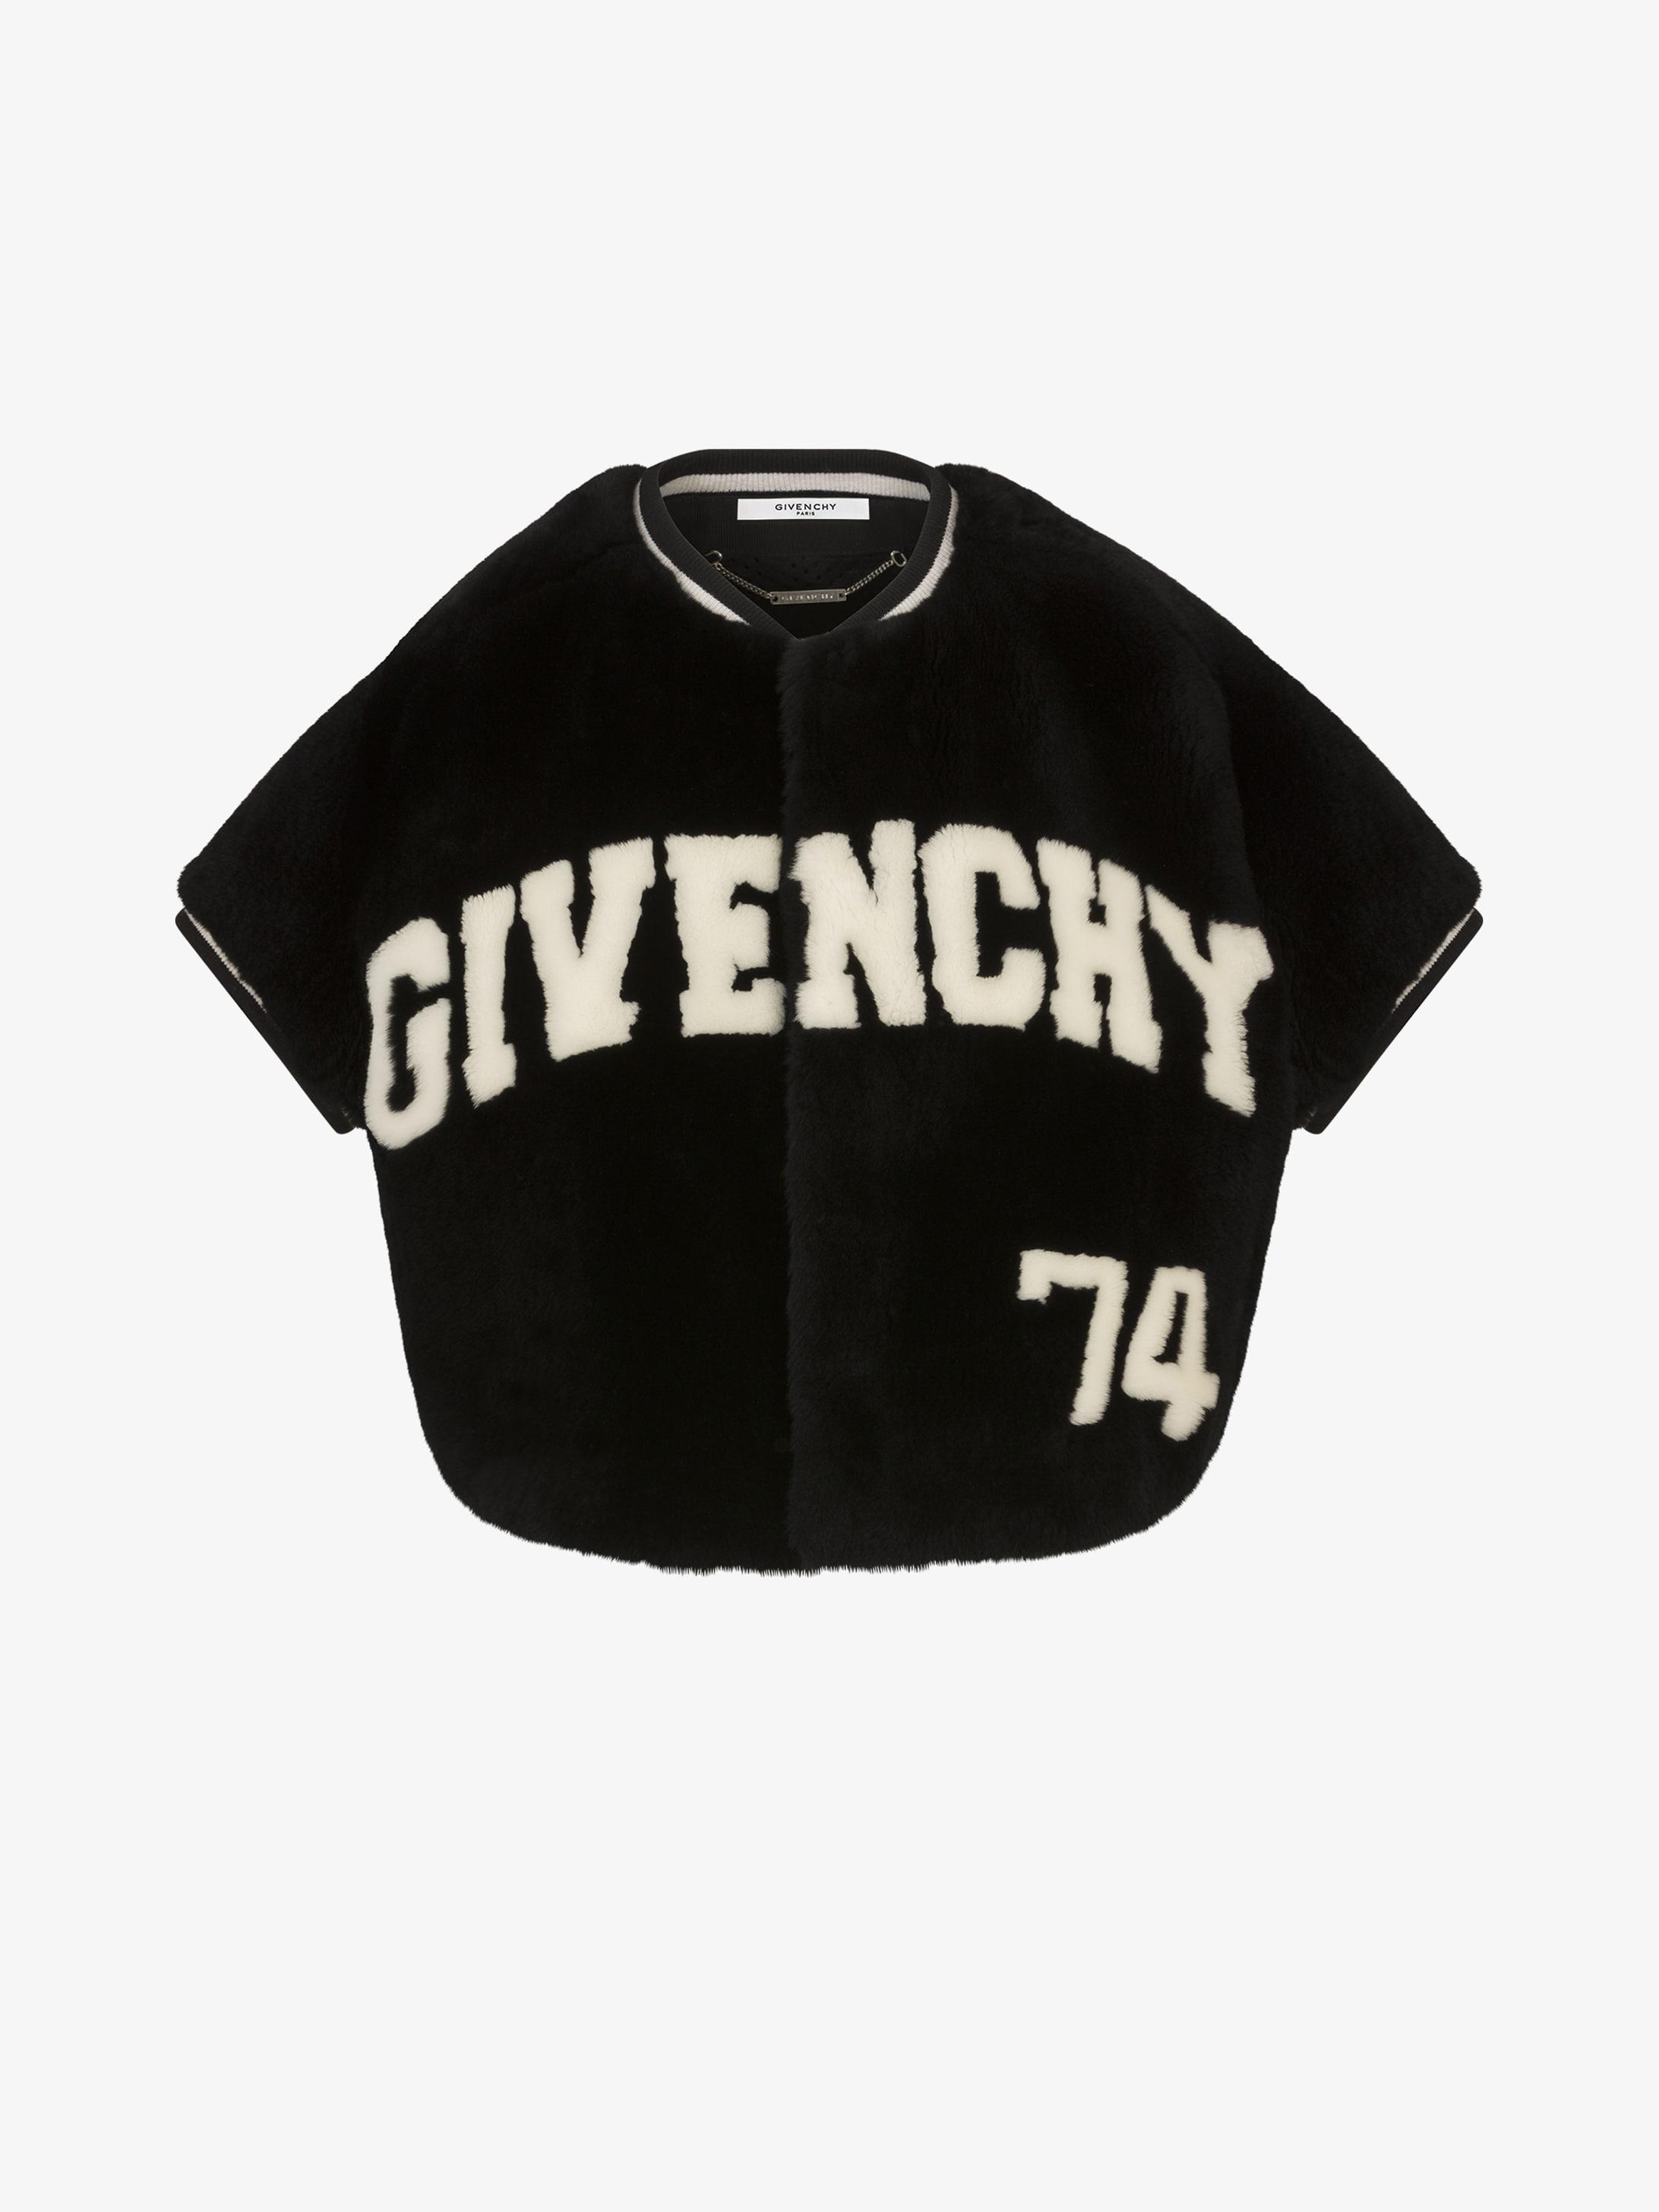 GIVENCHY 和 数字74印花海狸毛皮短款夹克